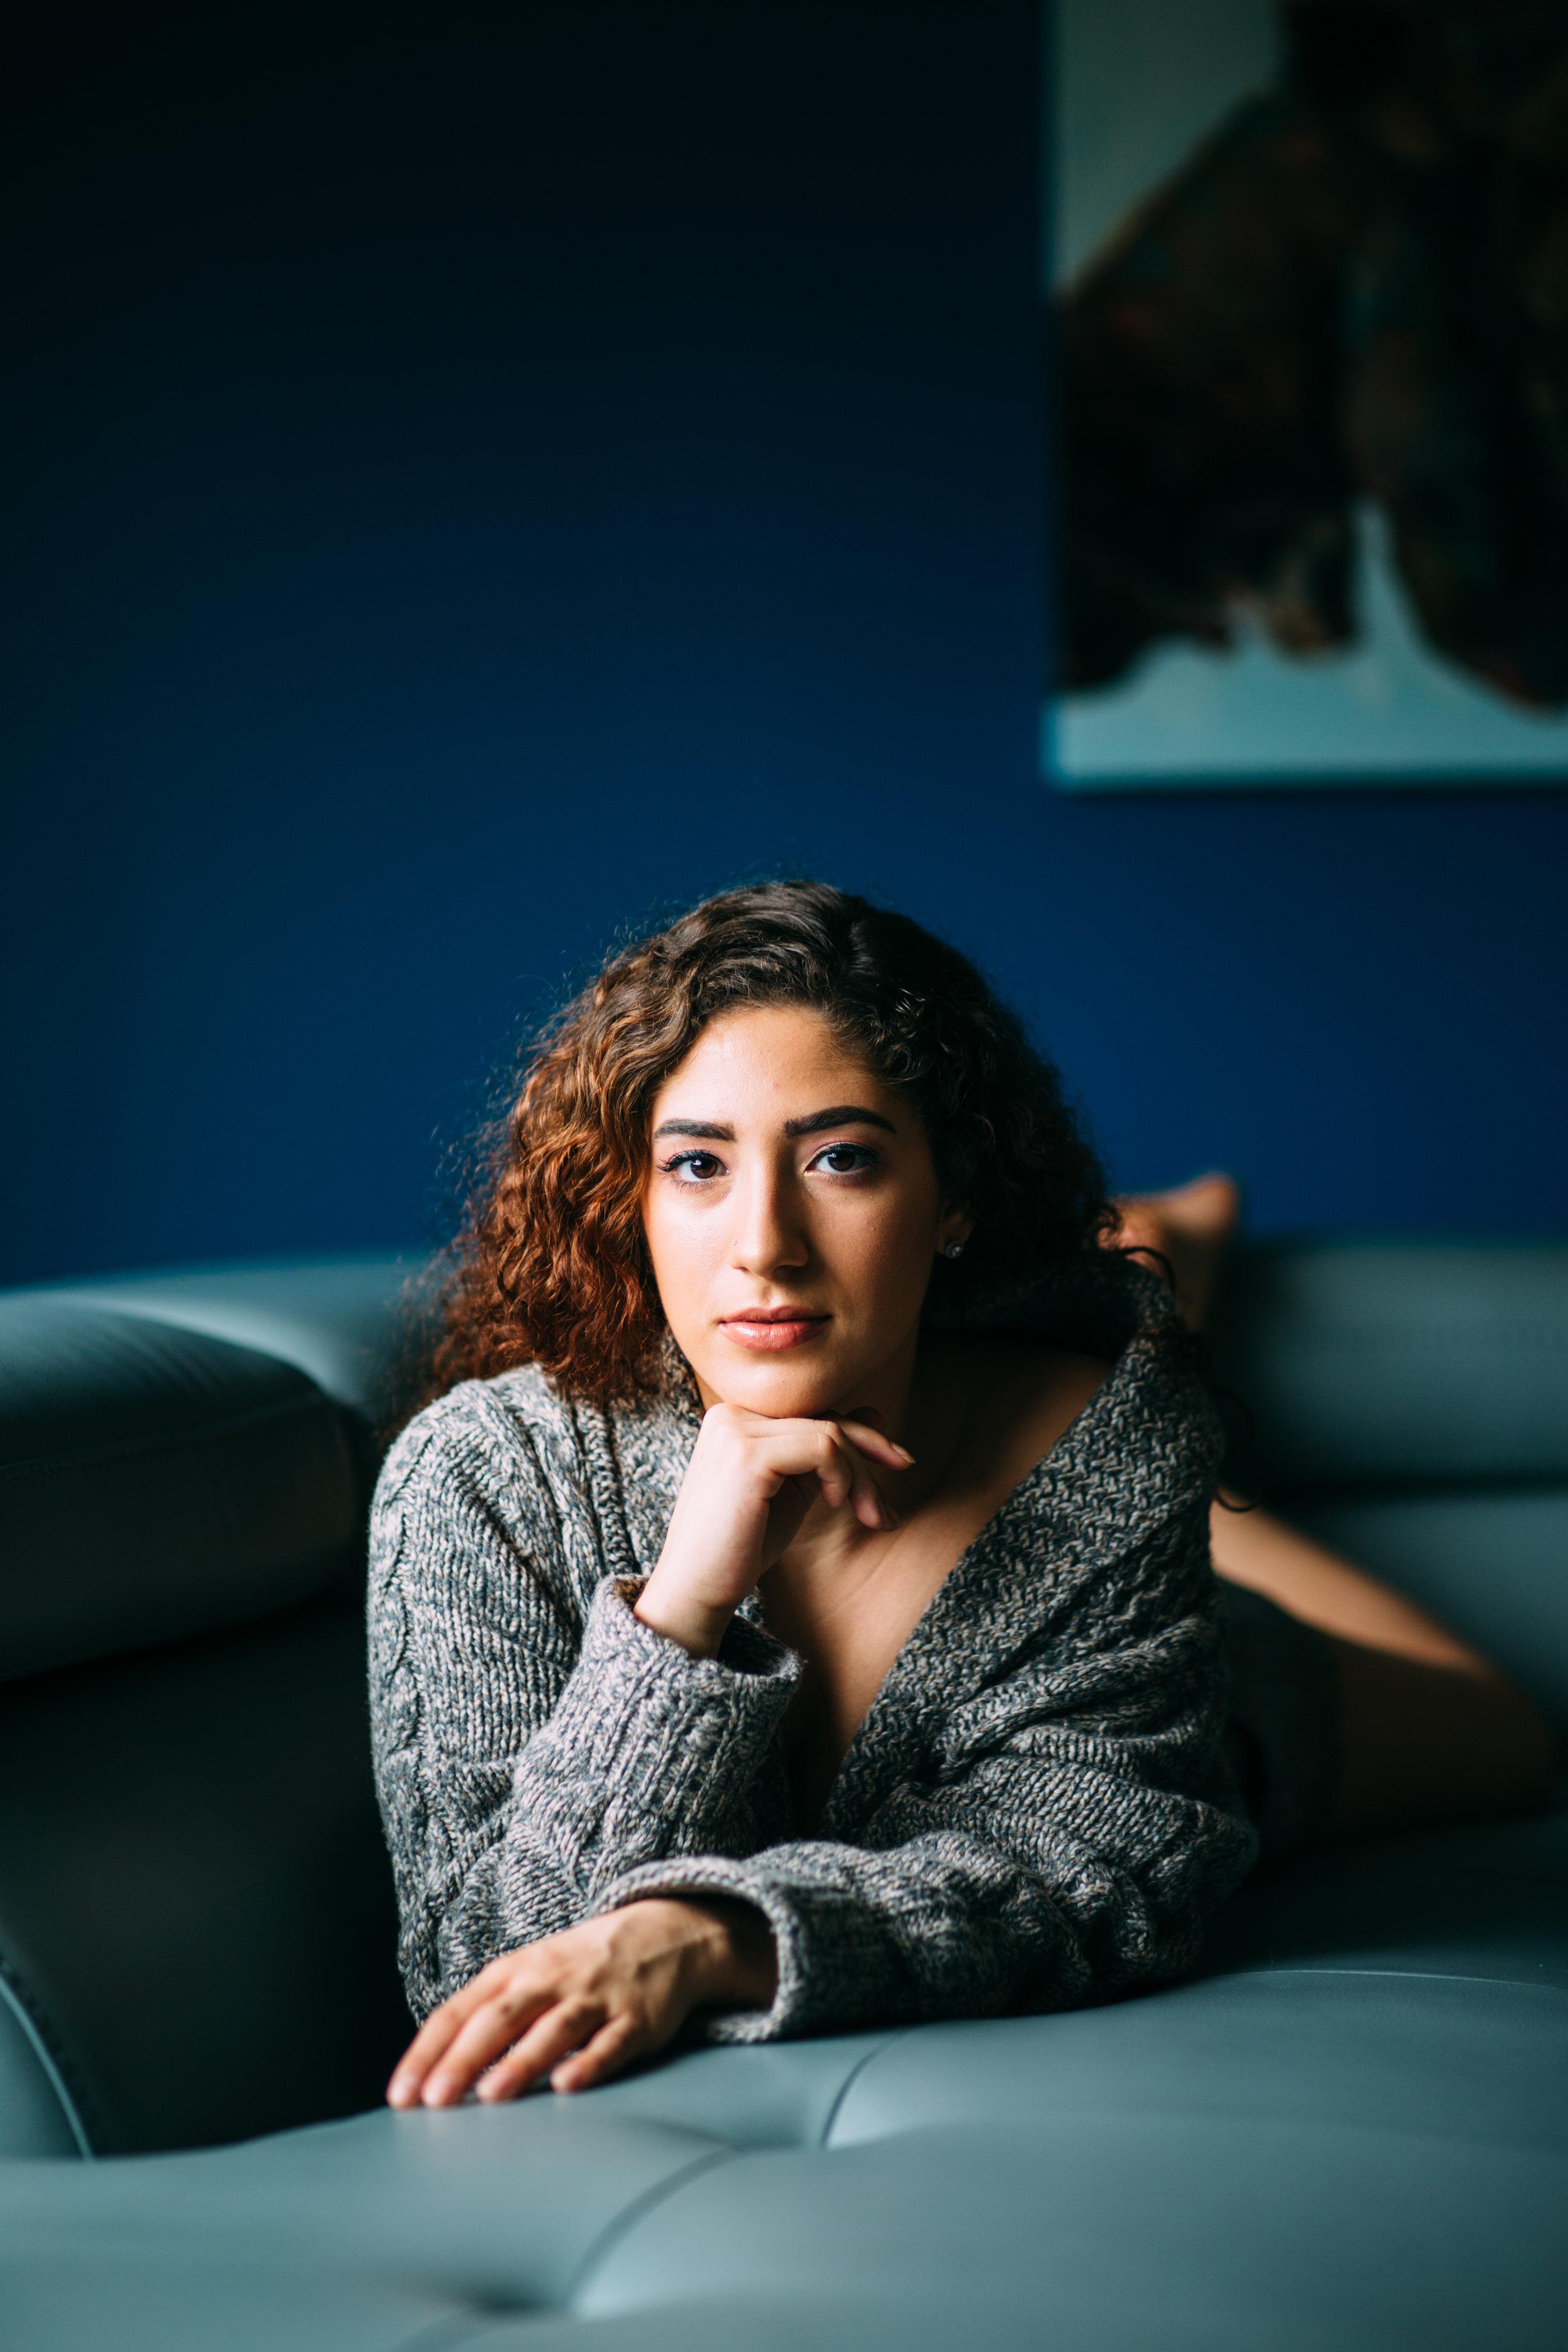 Monica Saggio by SWAY PHOTOS (9 of 15).JPG